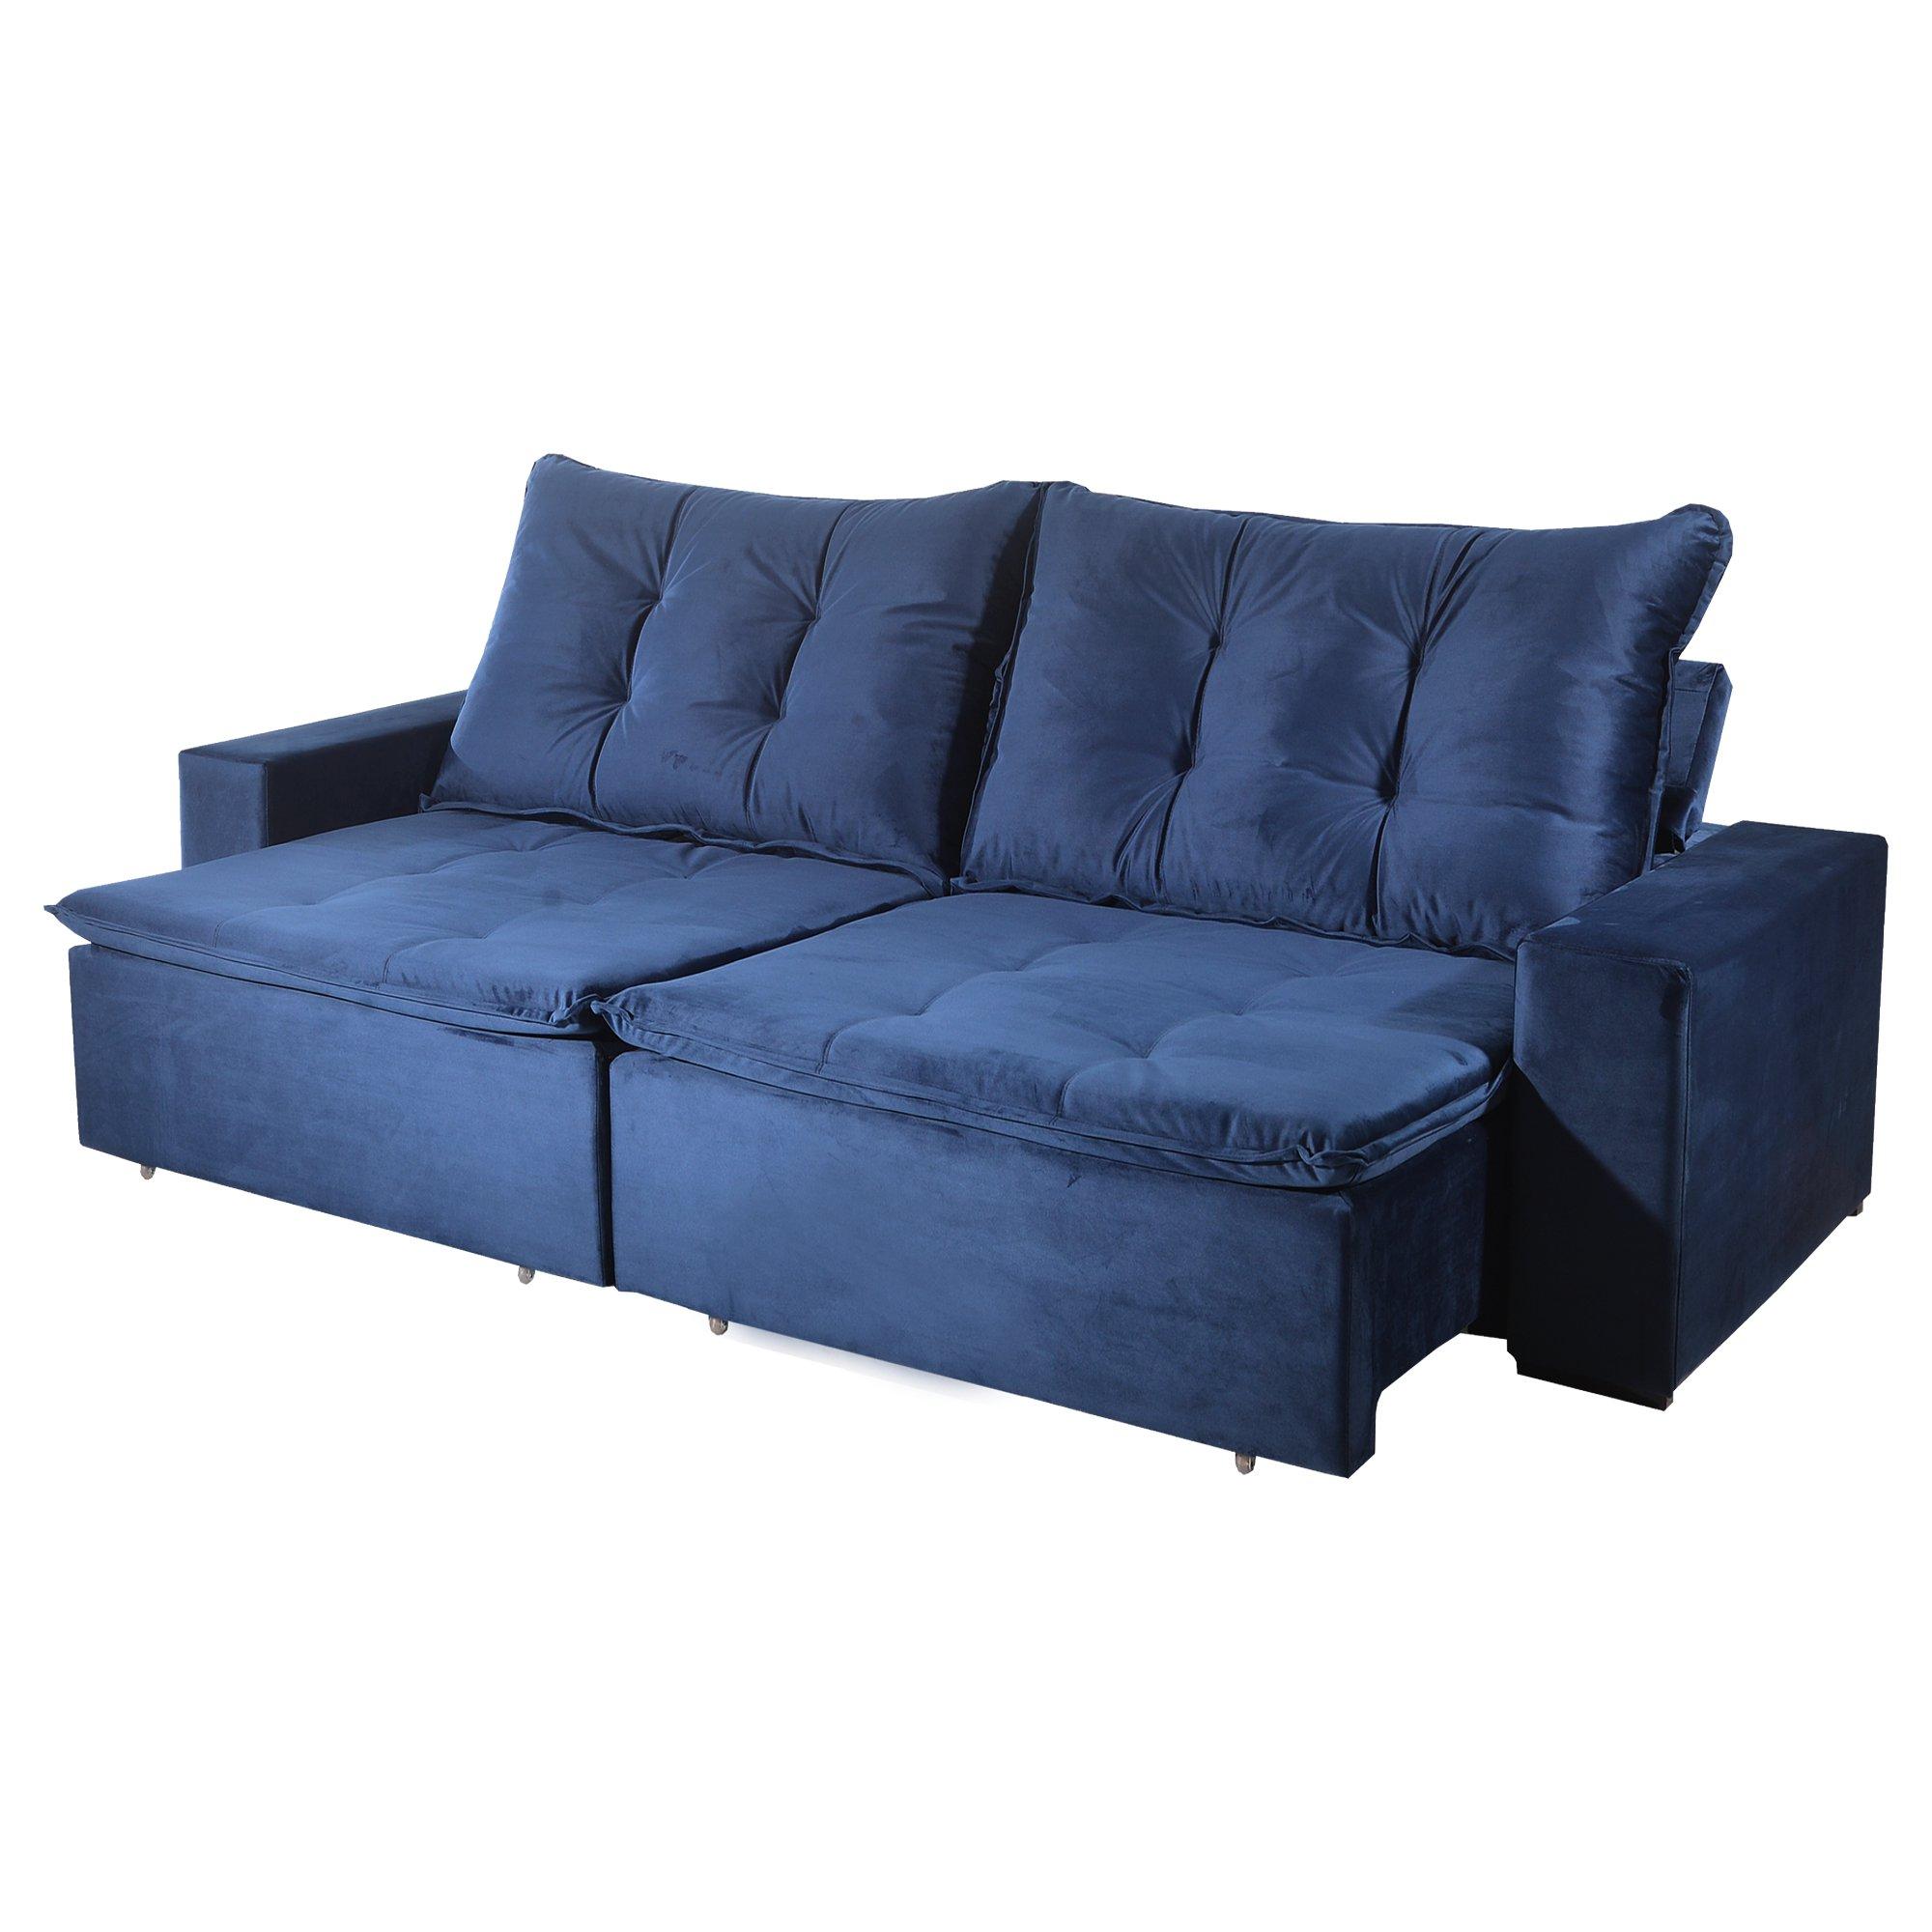 Sofá Retrátil e Reclinável Bom Pastor Stella 5 Lugares 2,90m Veludo Luxo Azul